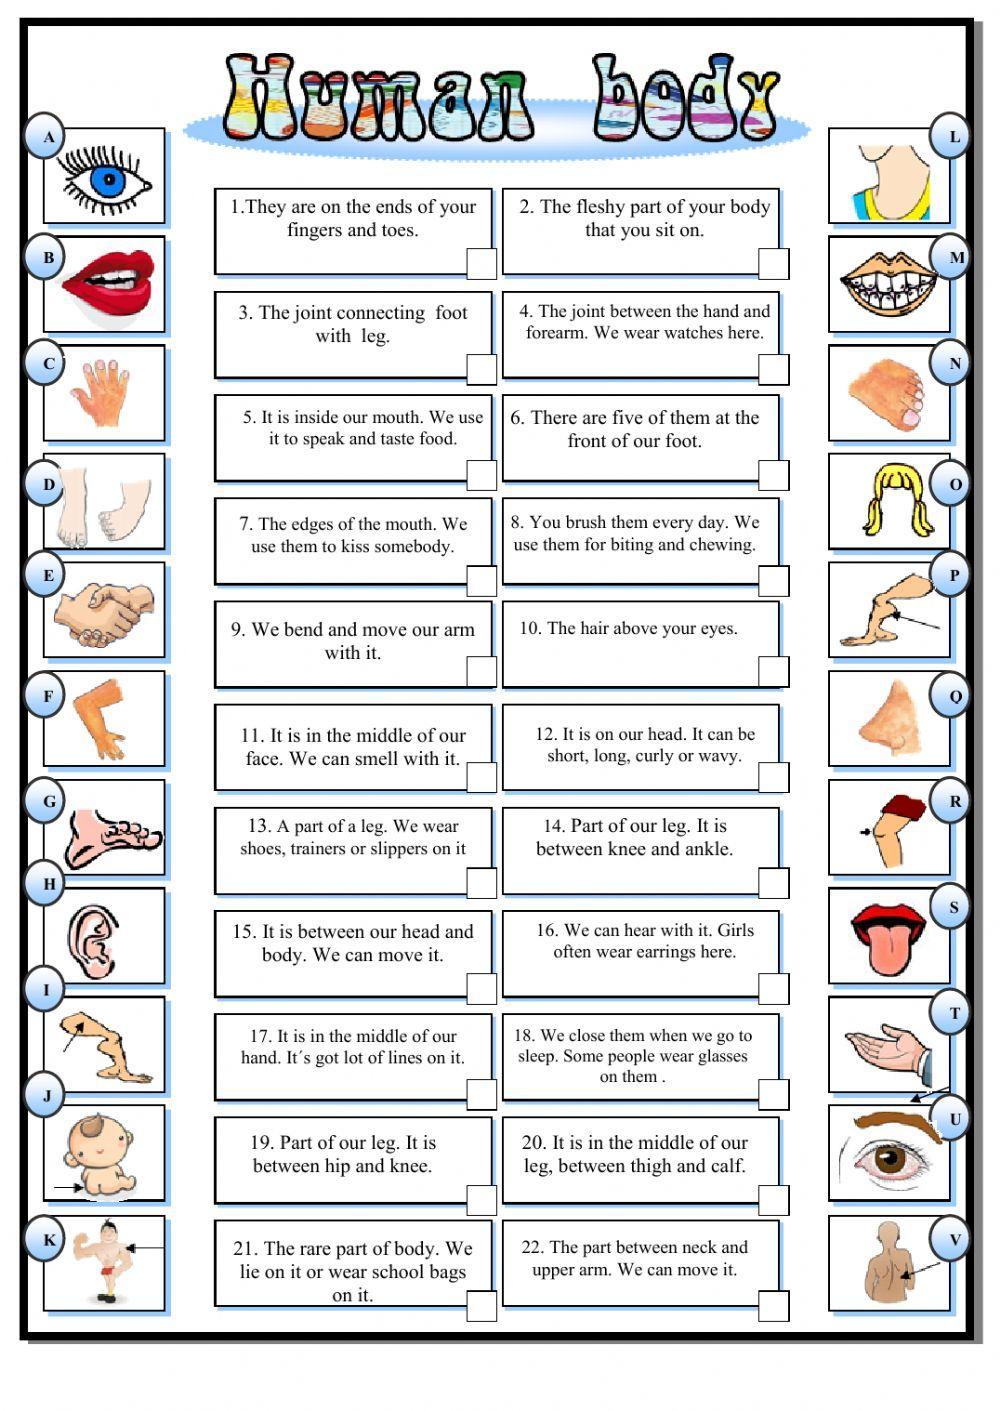 My Body Interactive Worksheet English Activities For Kids Vocabulary Worksheets English Activities [ 1411 x 1000 Pixel ]